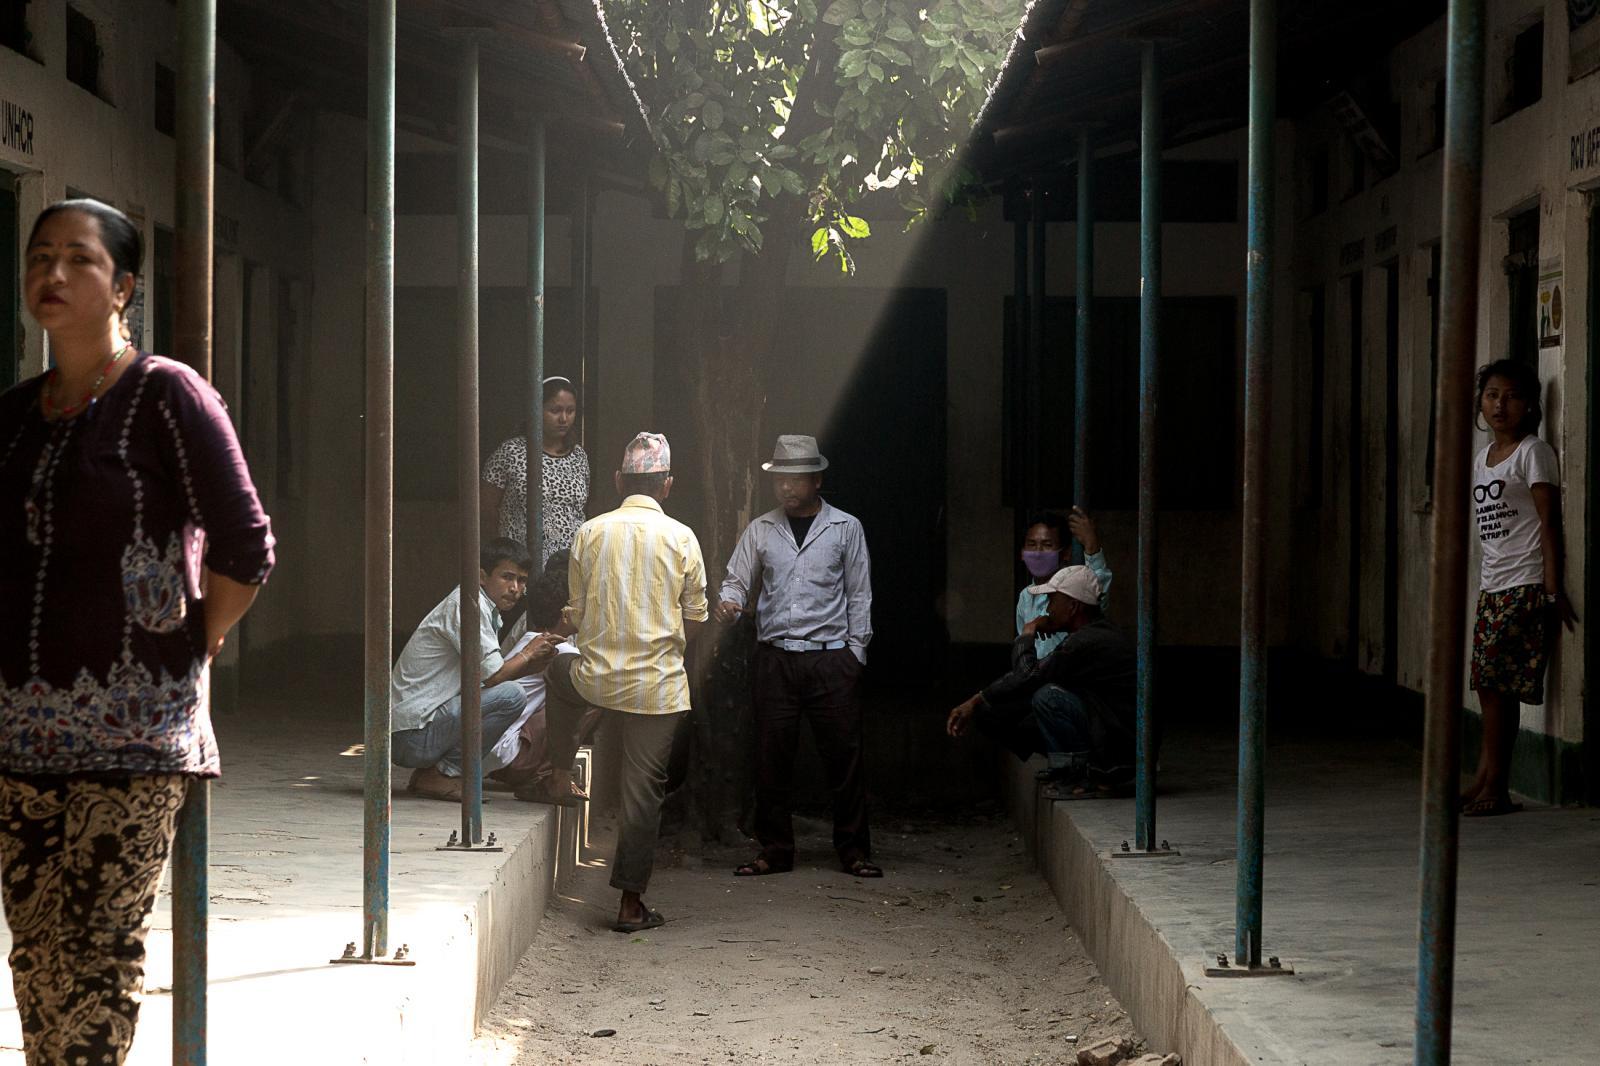 Photography image - Loading 003_Bhutan-Refugee-Omar-Havana.jpg